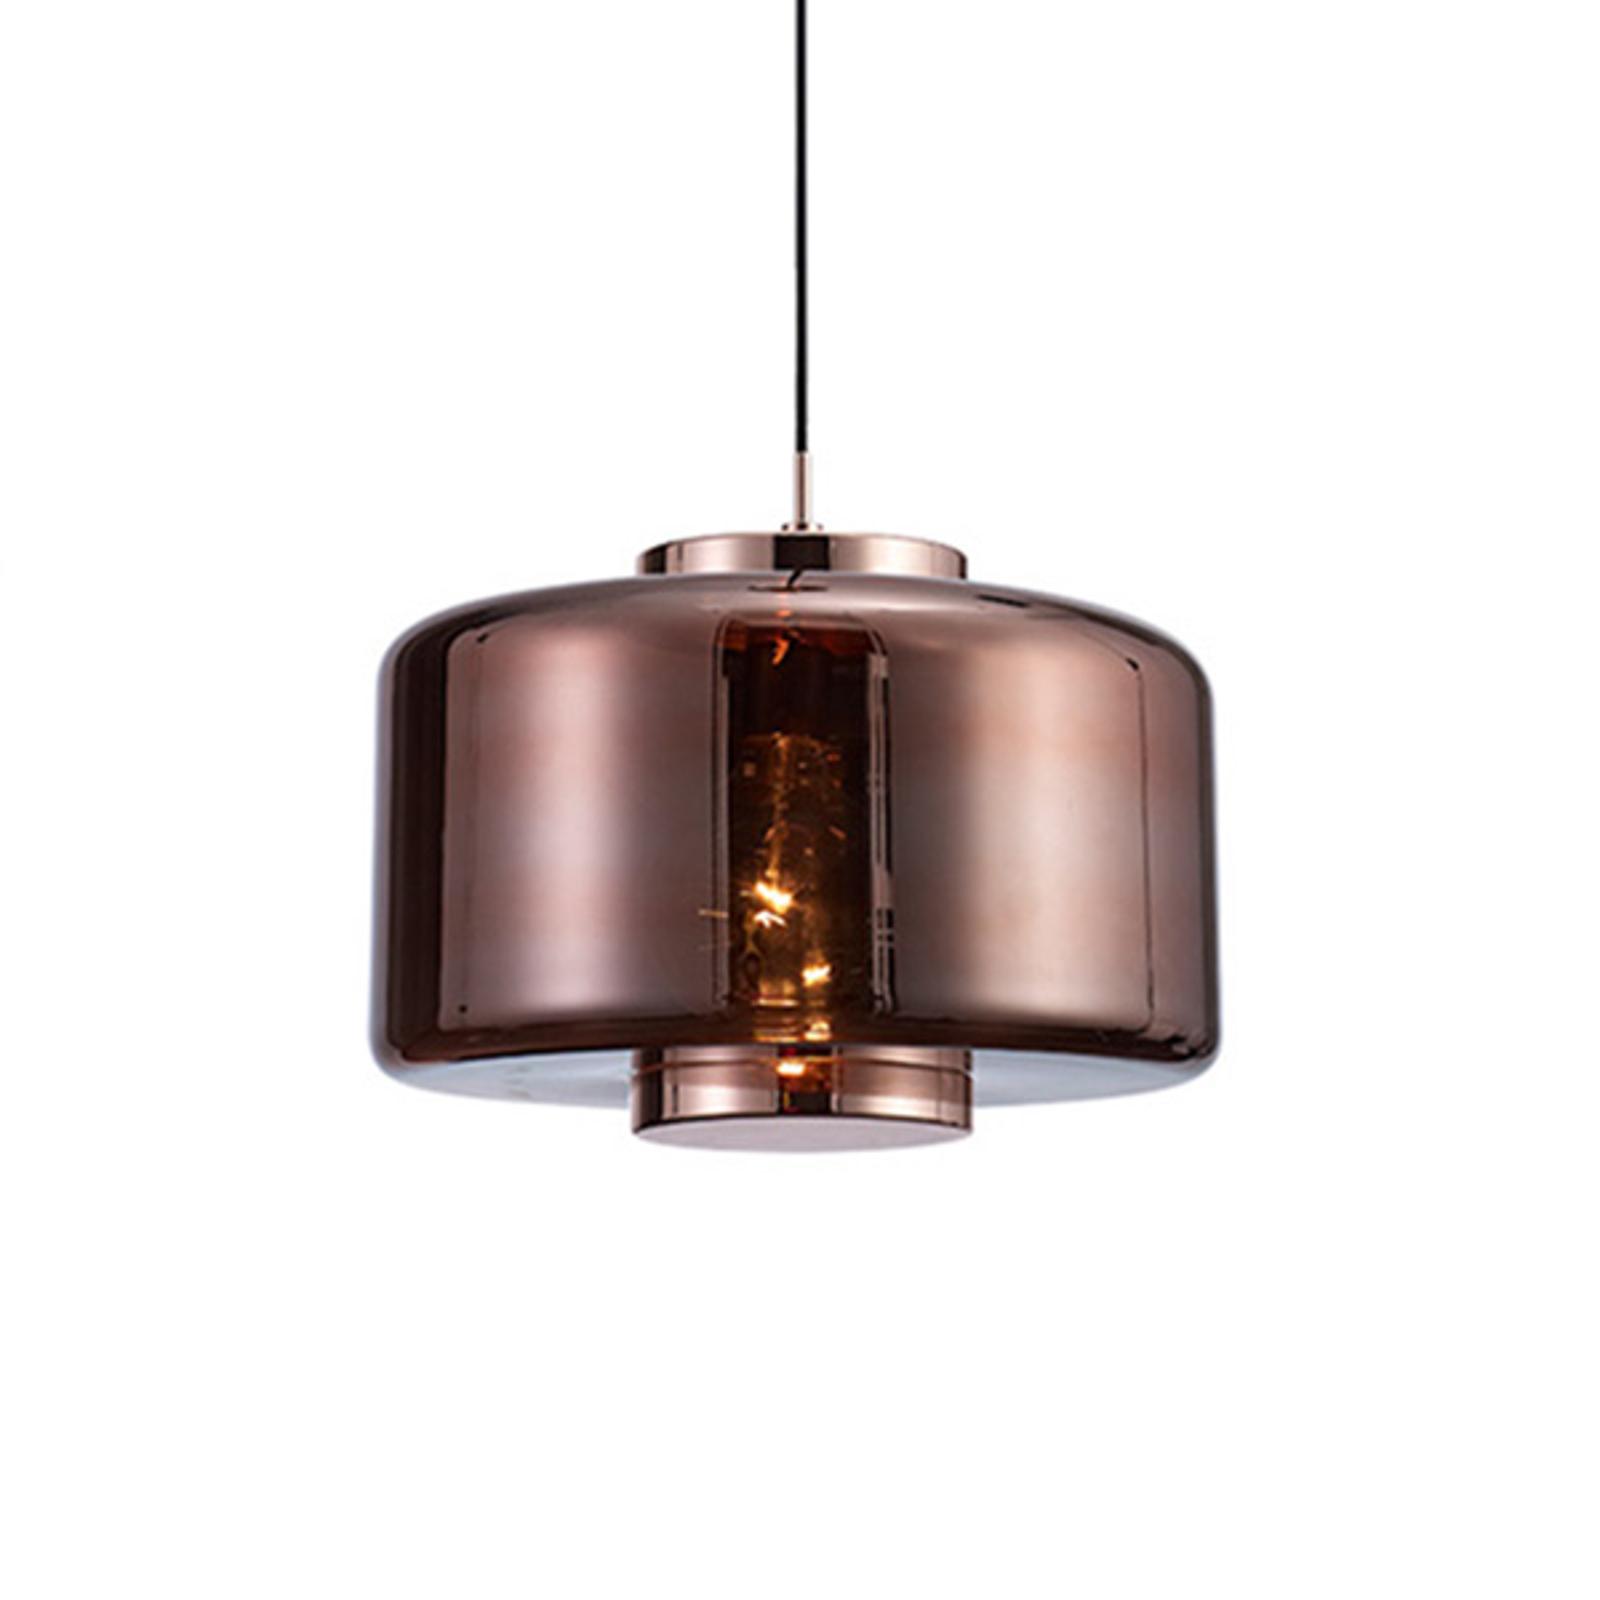 Lampada di vetro Jarras Ø 40 cm, rame